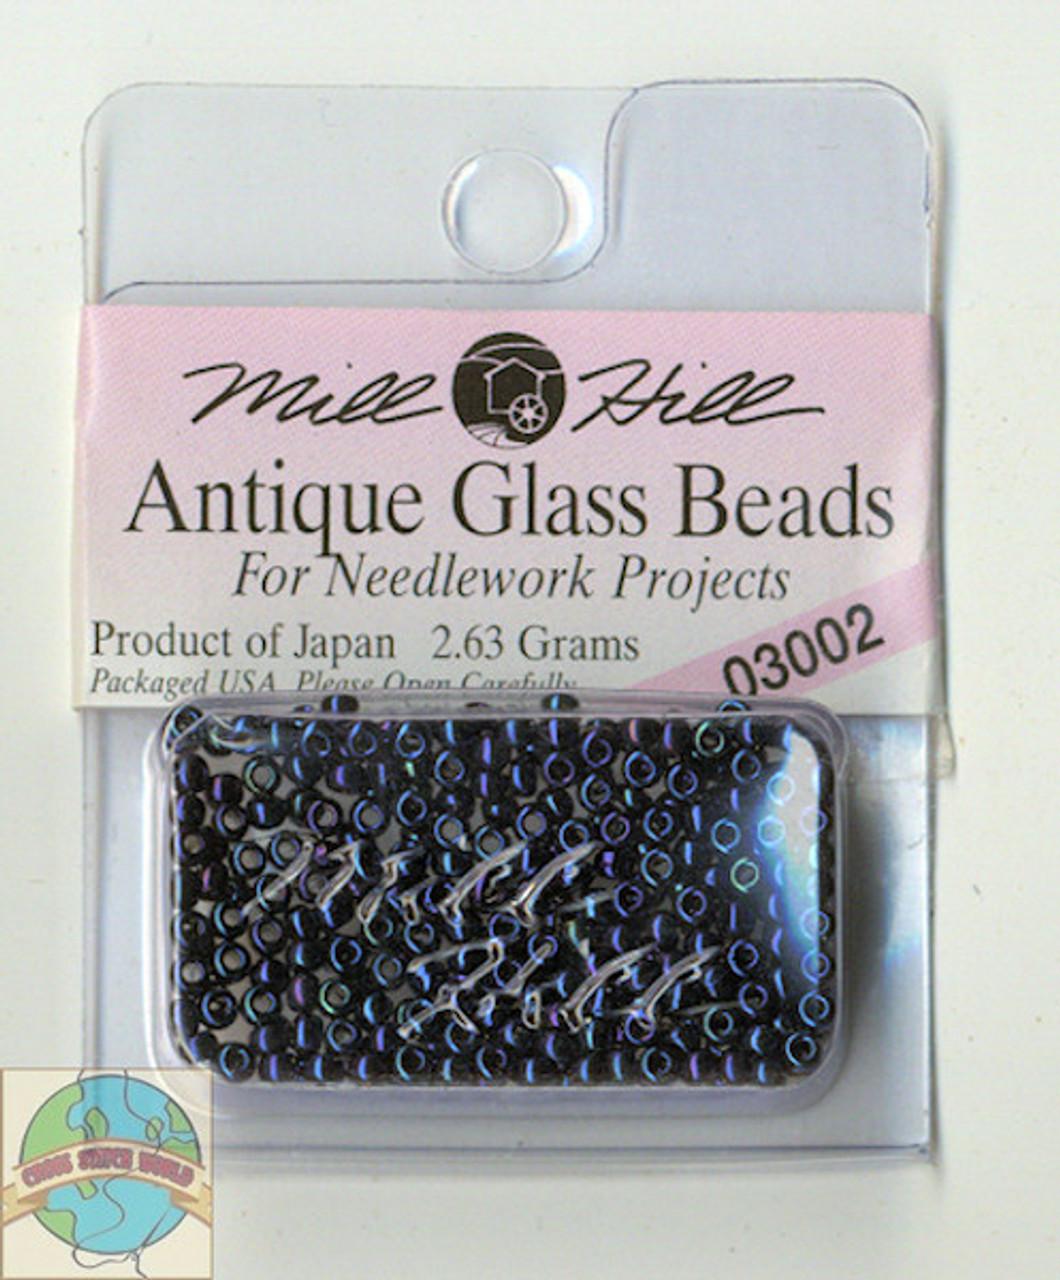 Mill Hill Antique Glass Beads 2.63g Midnight #03002